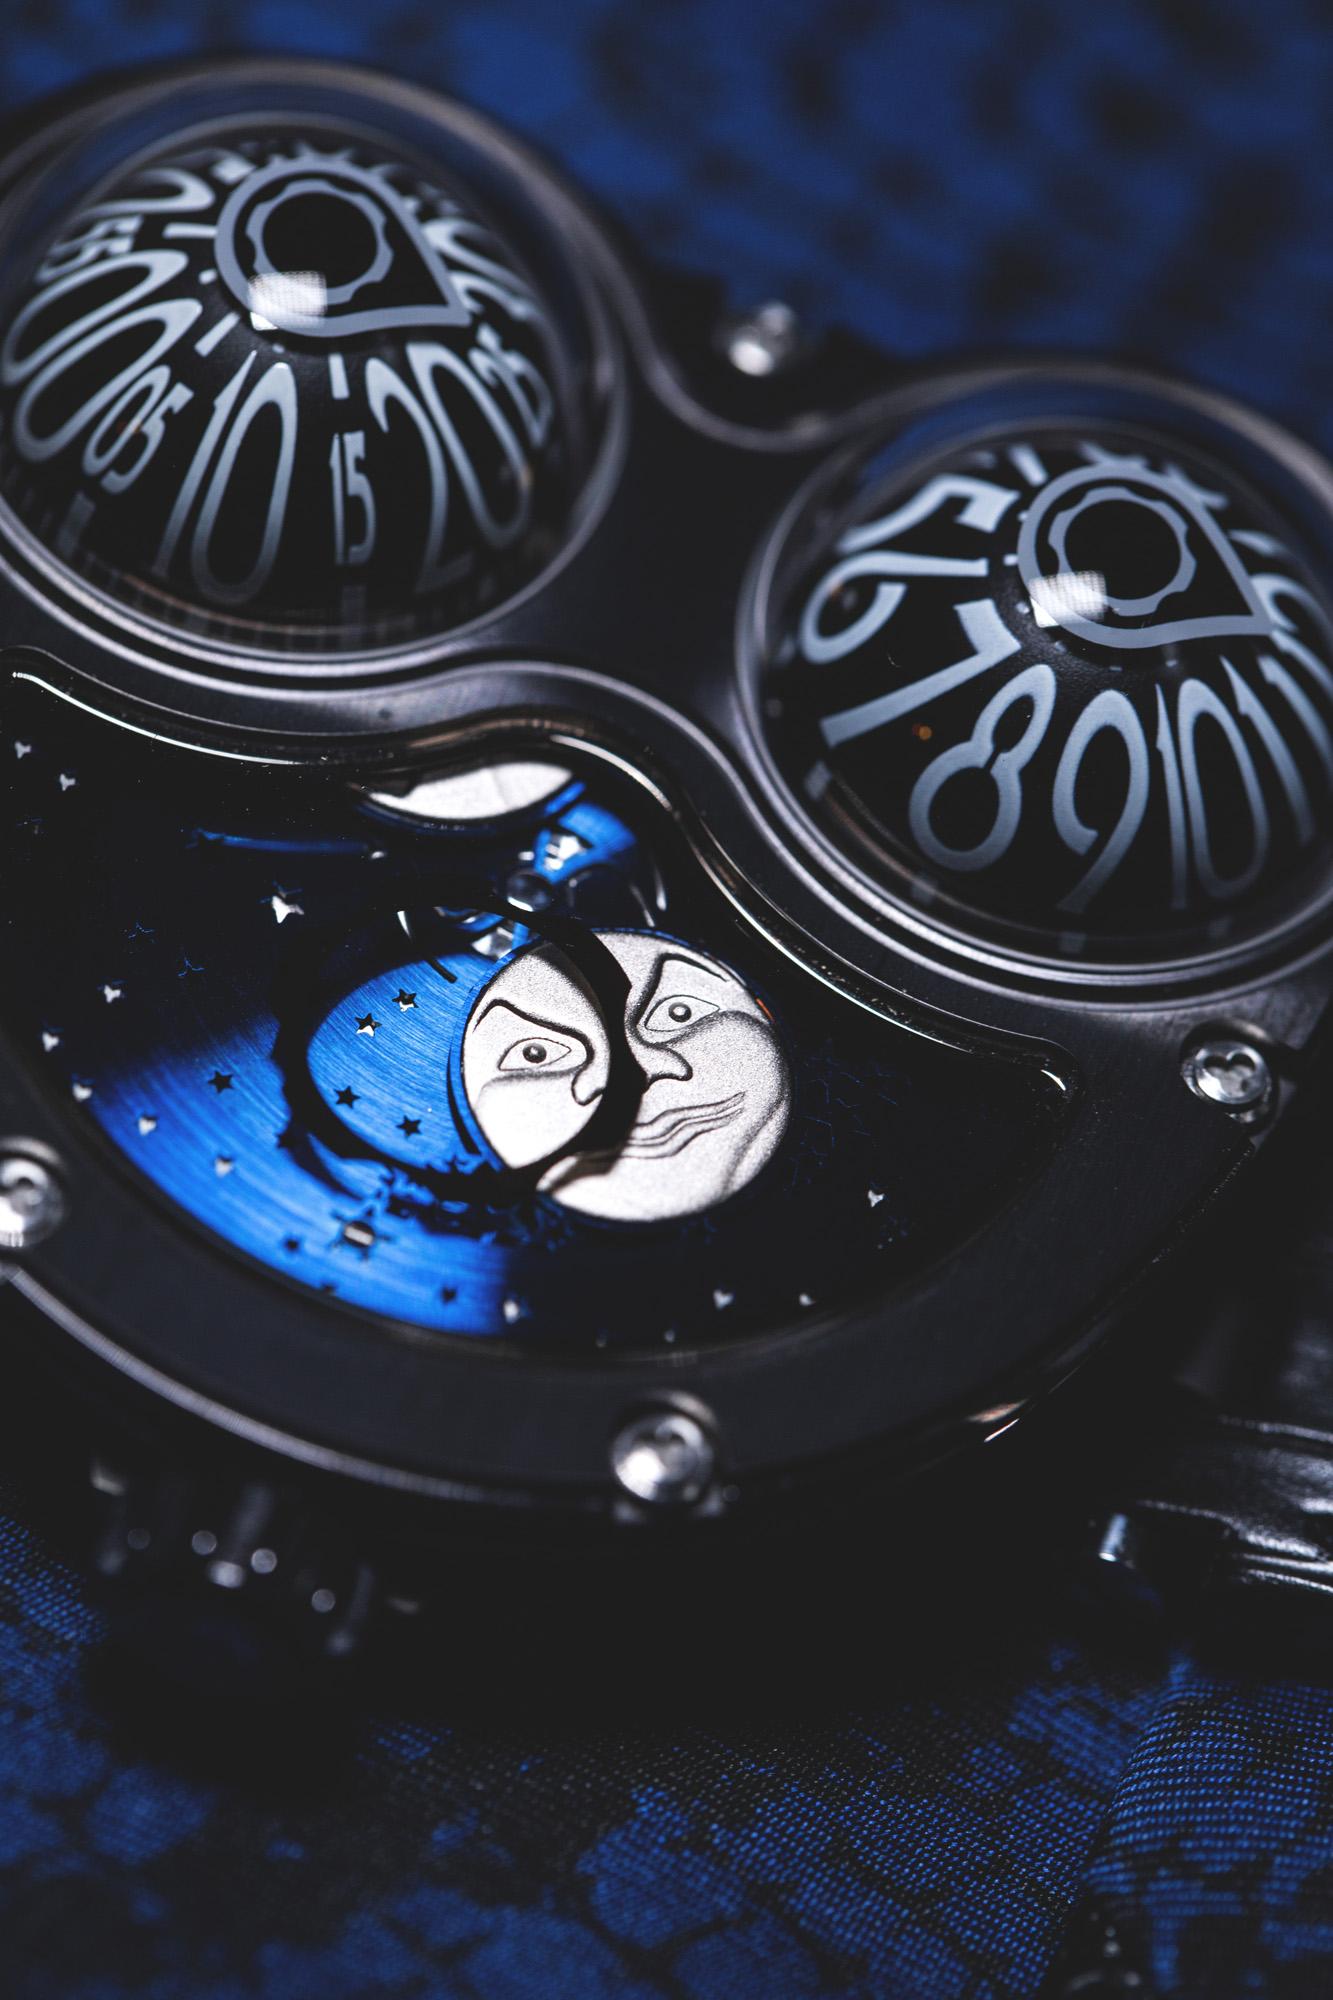 MB&F Moonmachine (by Stepan Sarpaneva)